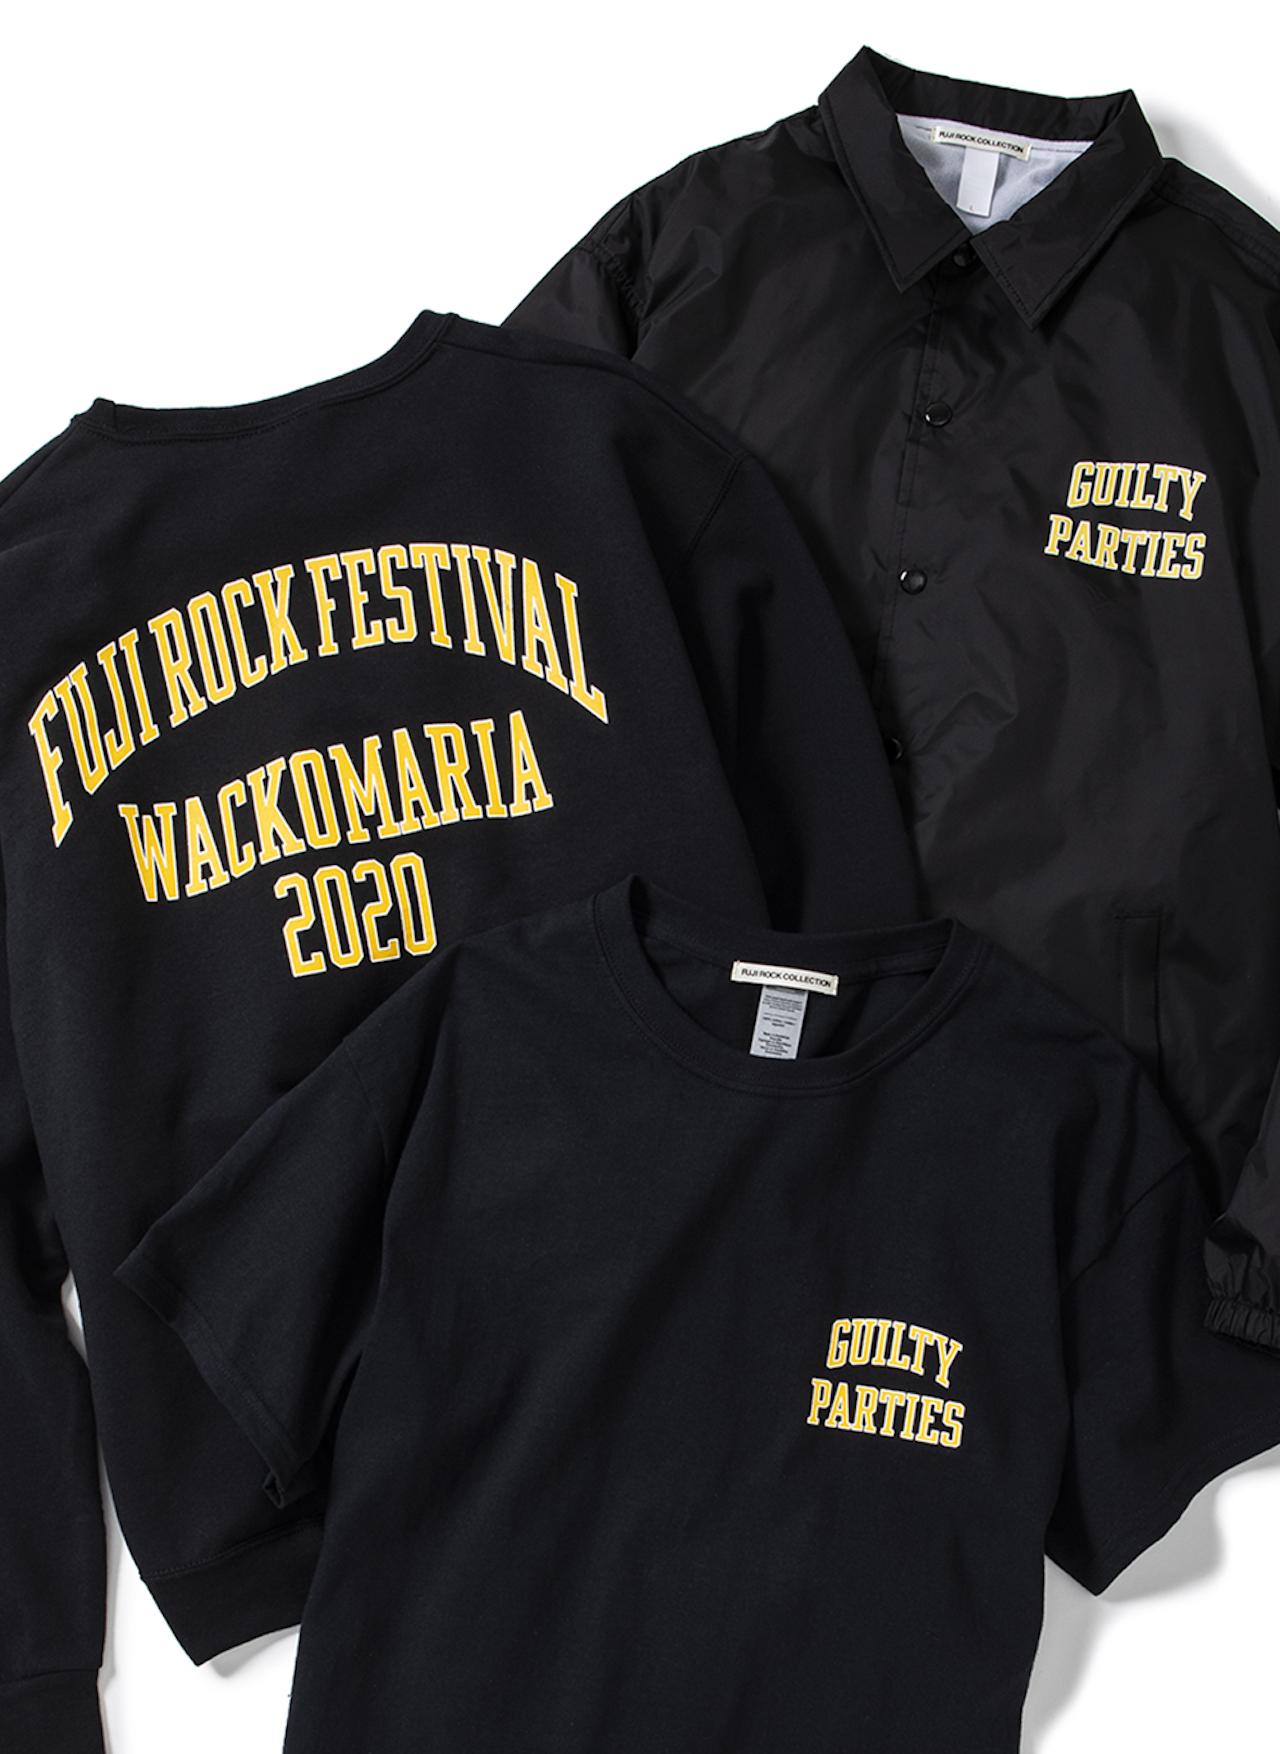 「FUJI ROCK FESTIVAL '20」チケット2次先行販売/オフィシャルツアー第2期受付スタート!新グッズにバックパックなど、新着情報盛りだくさん! music200403-fujirock2020-4-1